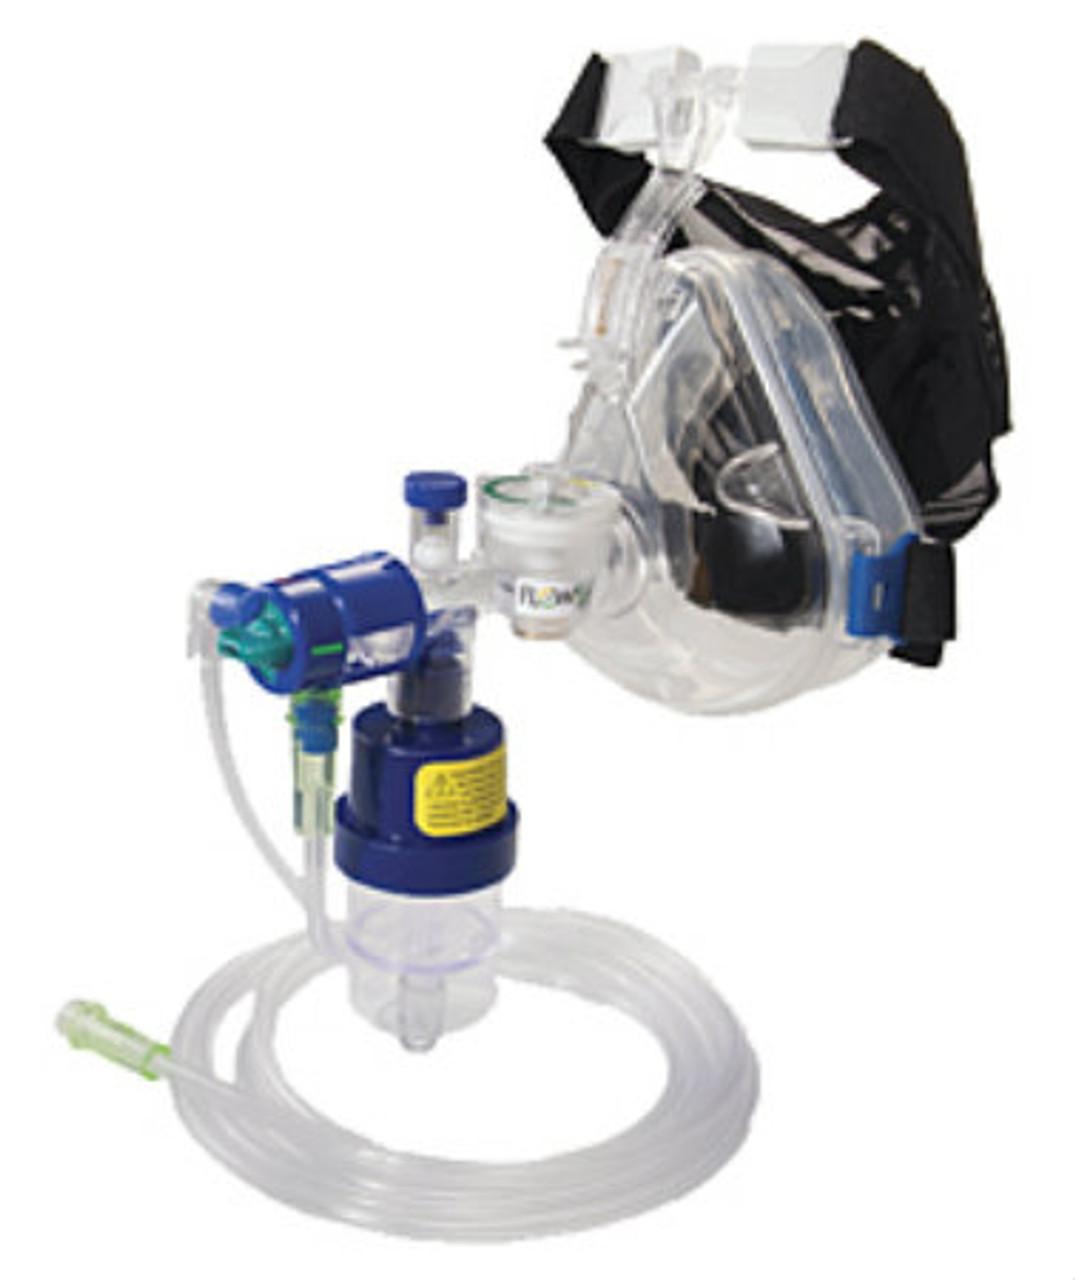 Flow-Safe2 EZ CPAP System by Mercury Medical